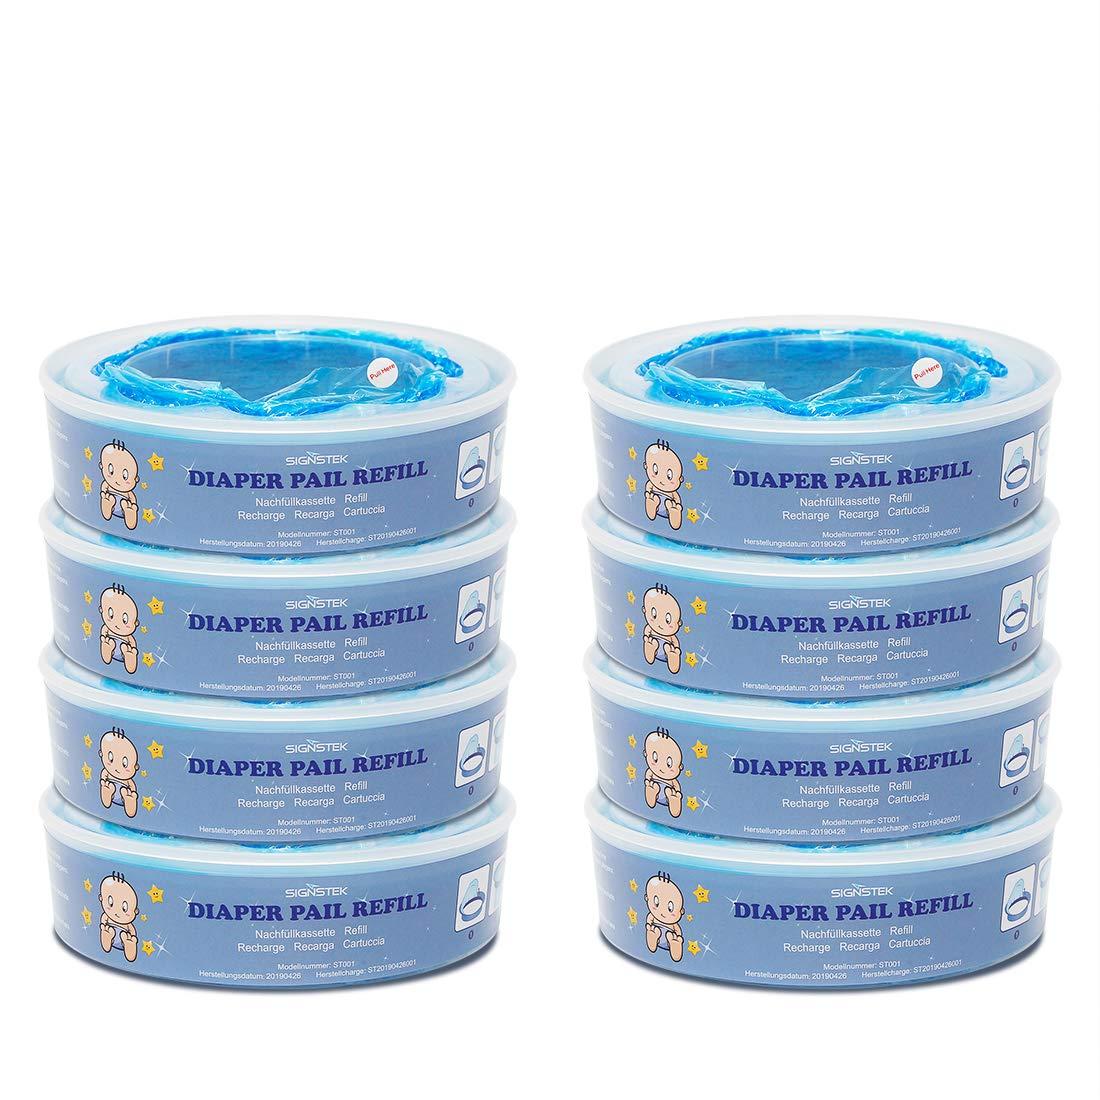 Signstek Diaper Pail Refills for Diaper Genie Pails,2160 Count,8-Pack by Signstek